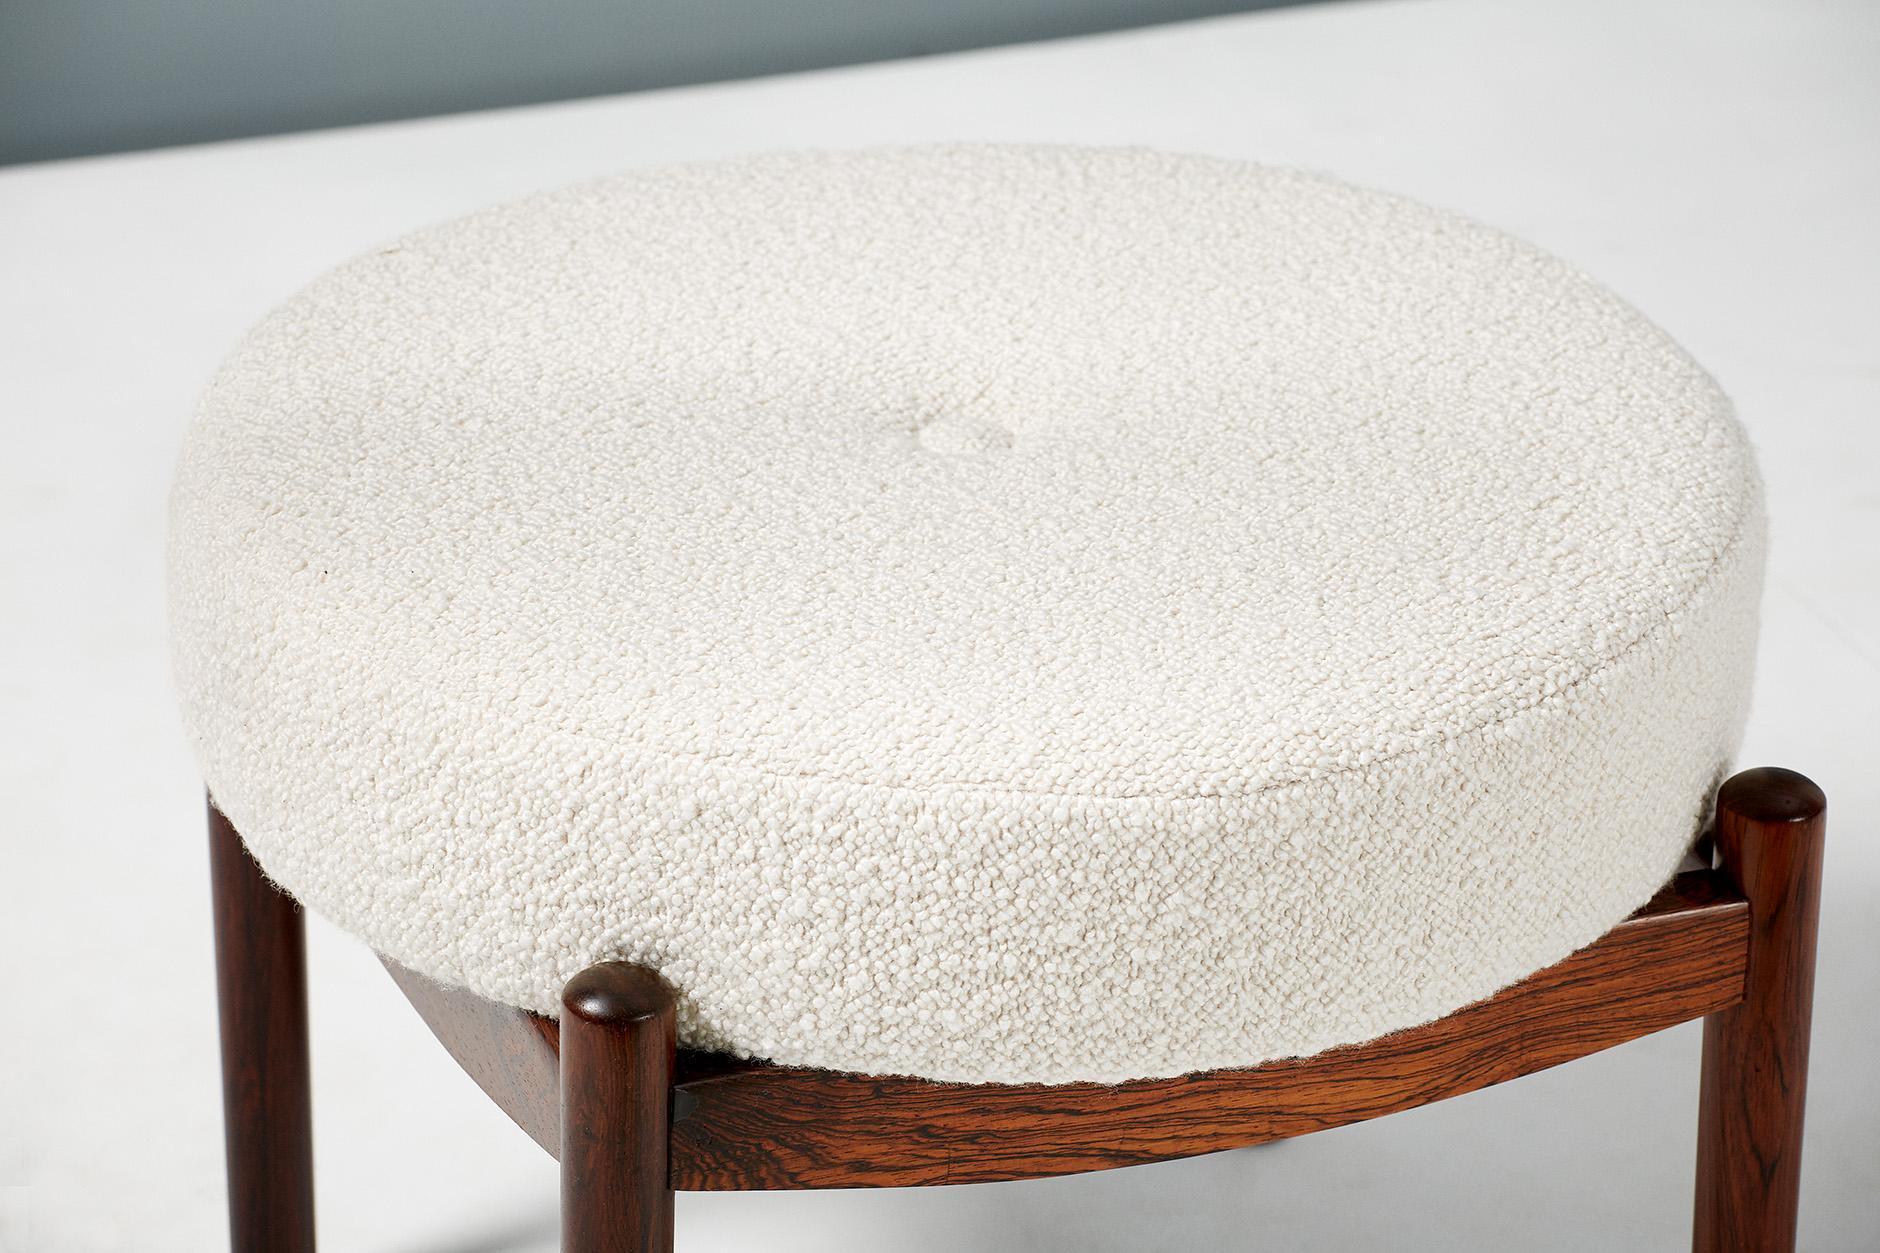 Sensational Pair Of Rosewood Vintage Circular Ottomans Circa 1950S Short Links Chair Design For Home Short Linksinfo